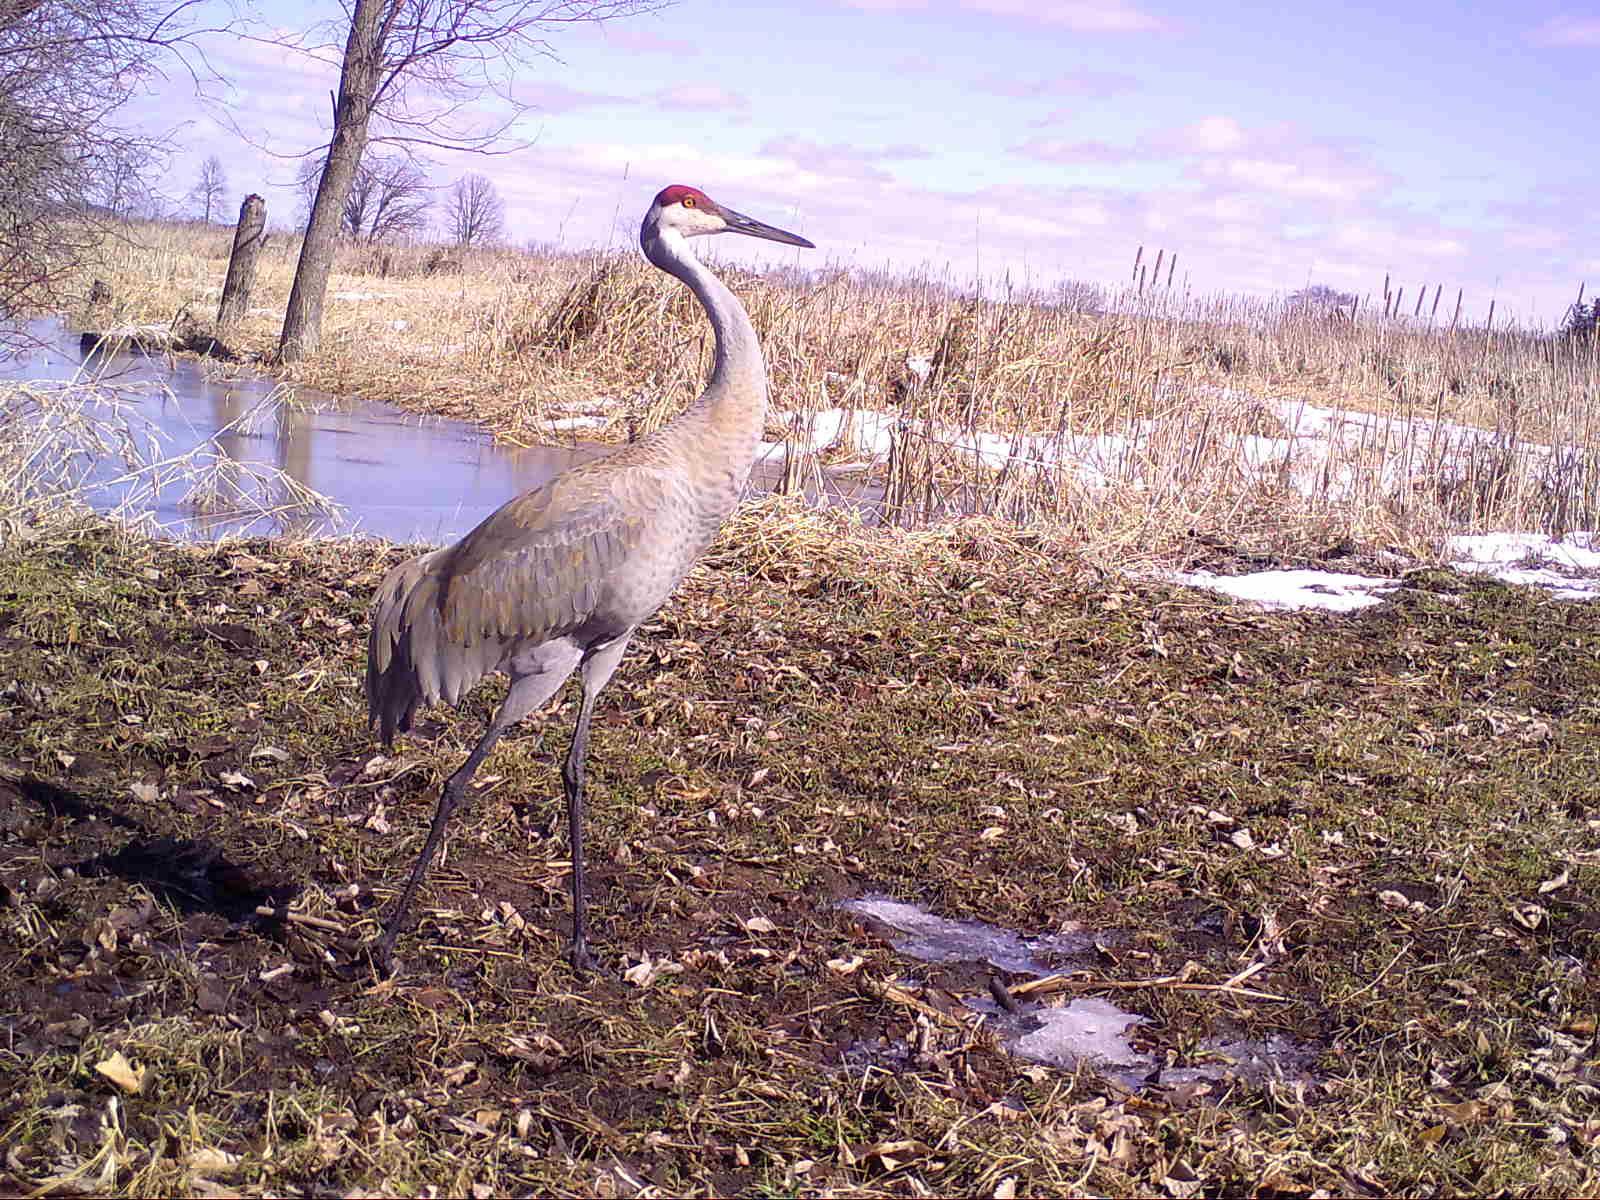 A sandhill crane in springtime